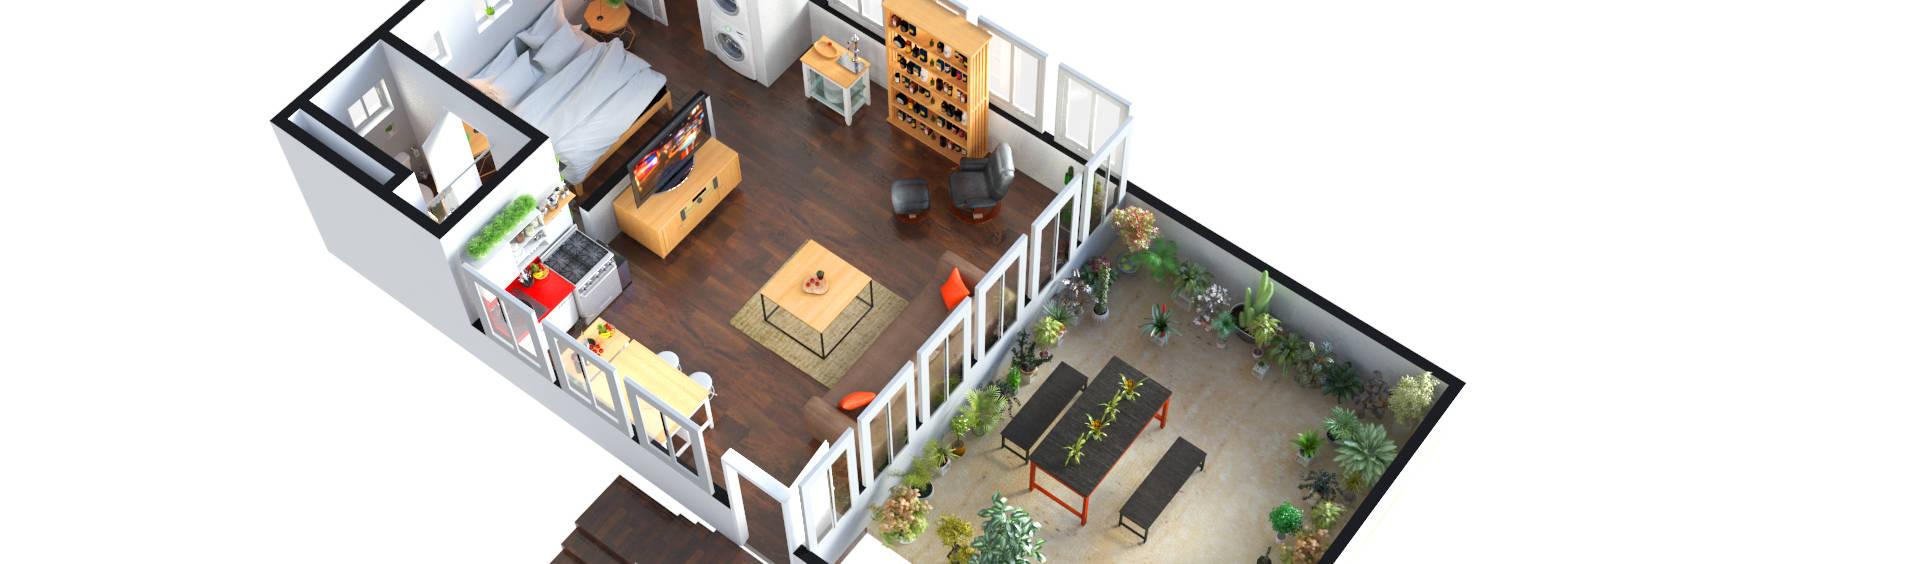 Rayvat Rendering Studio